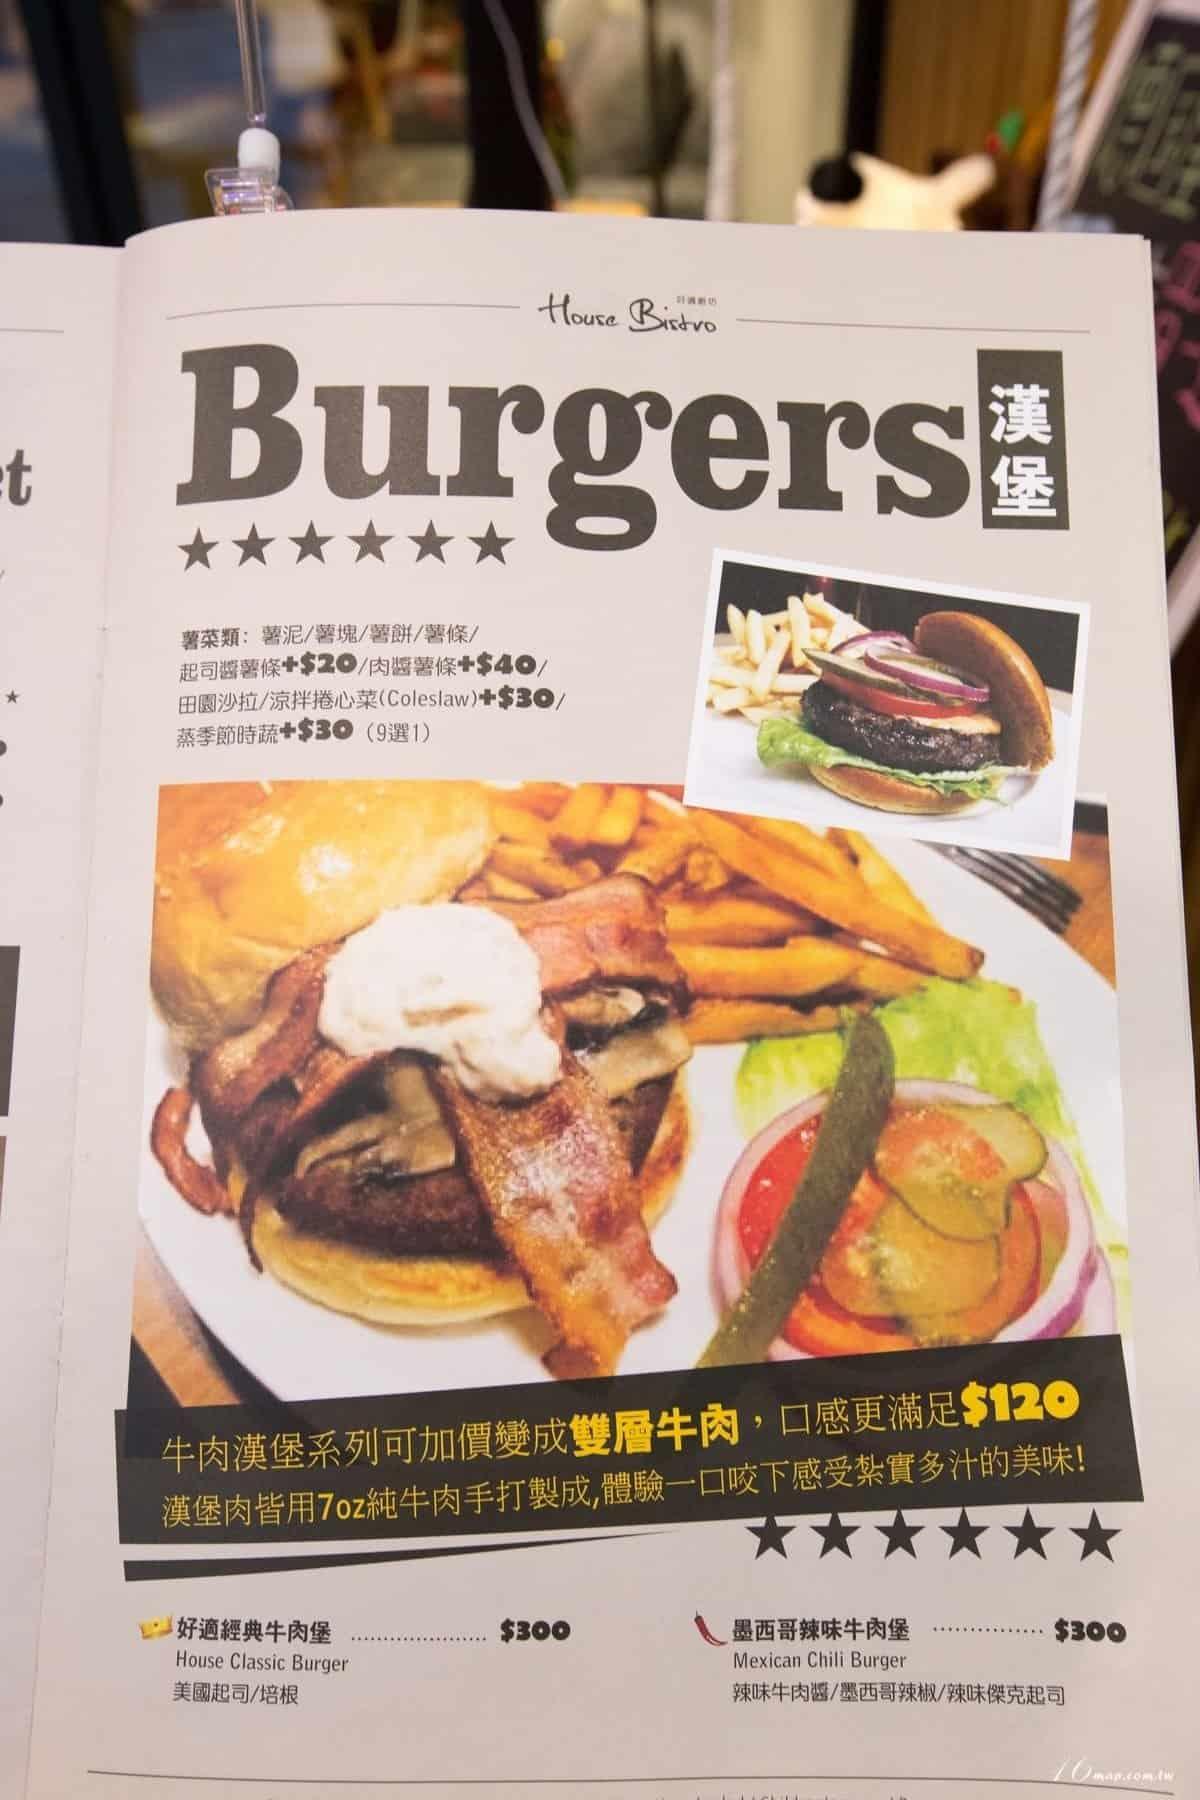 Housebistro-menu-4